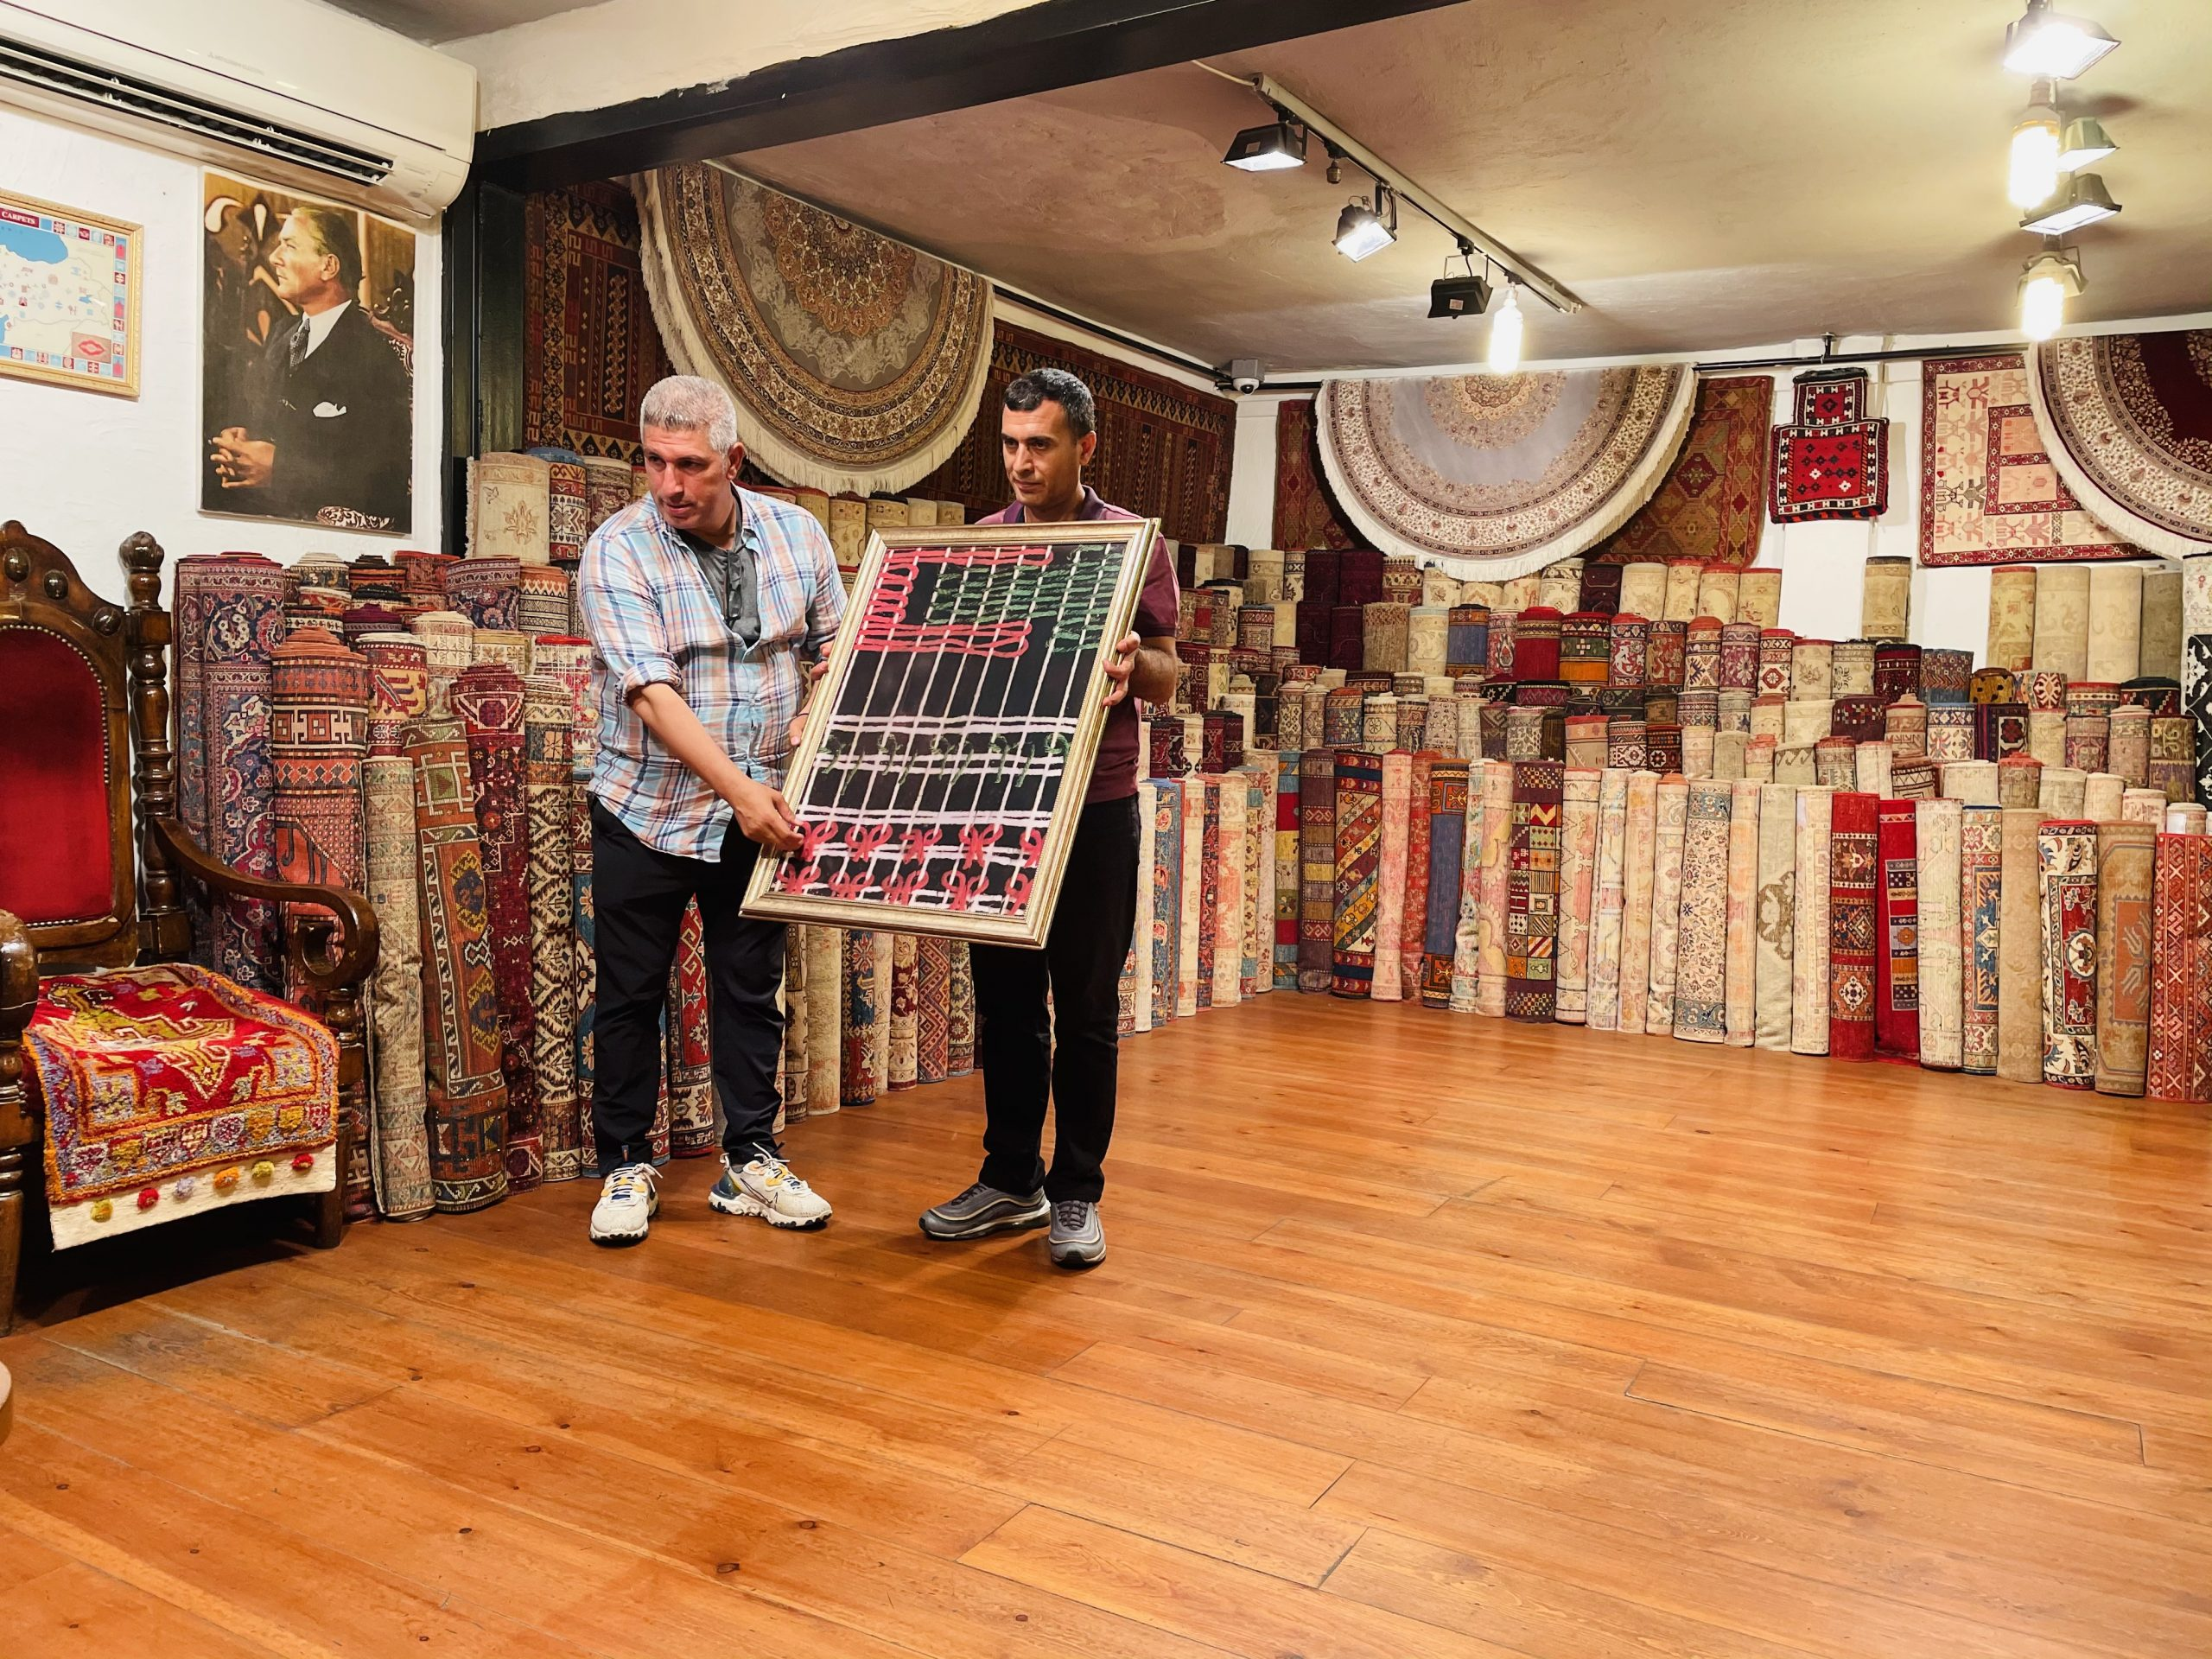 Buying a Turkish Carpet in Turkey